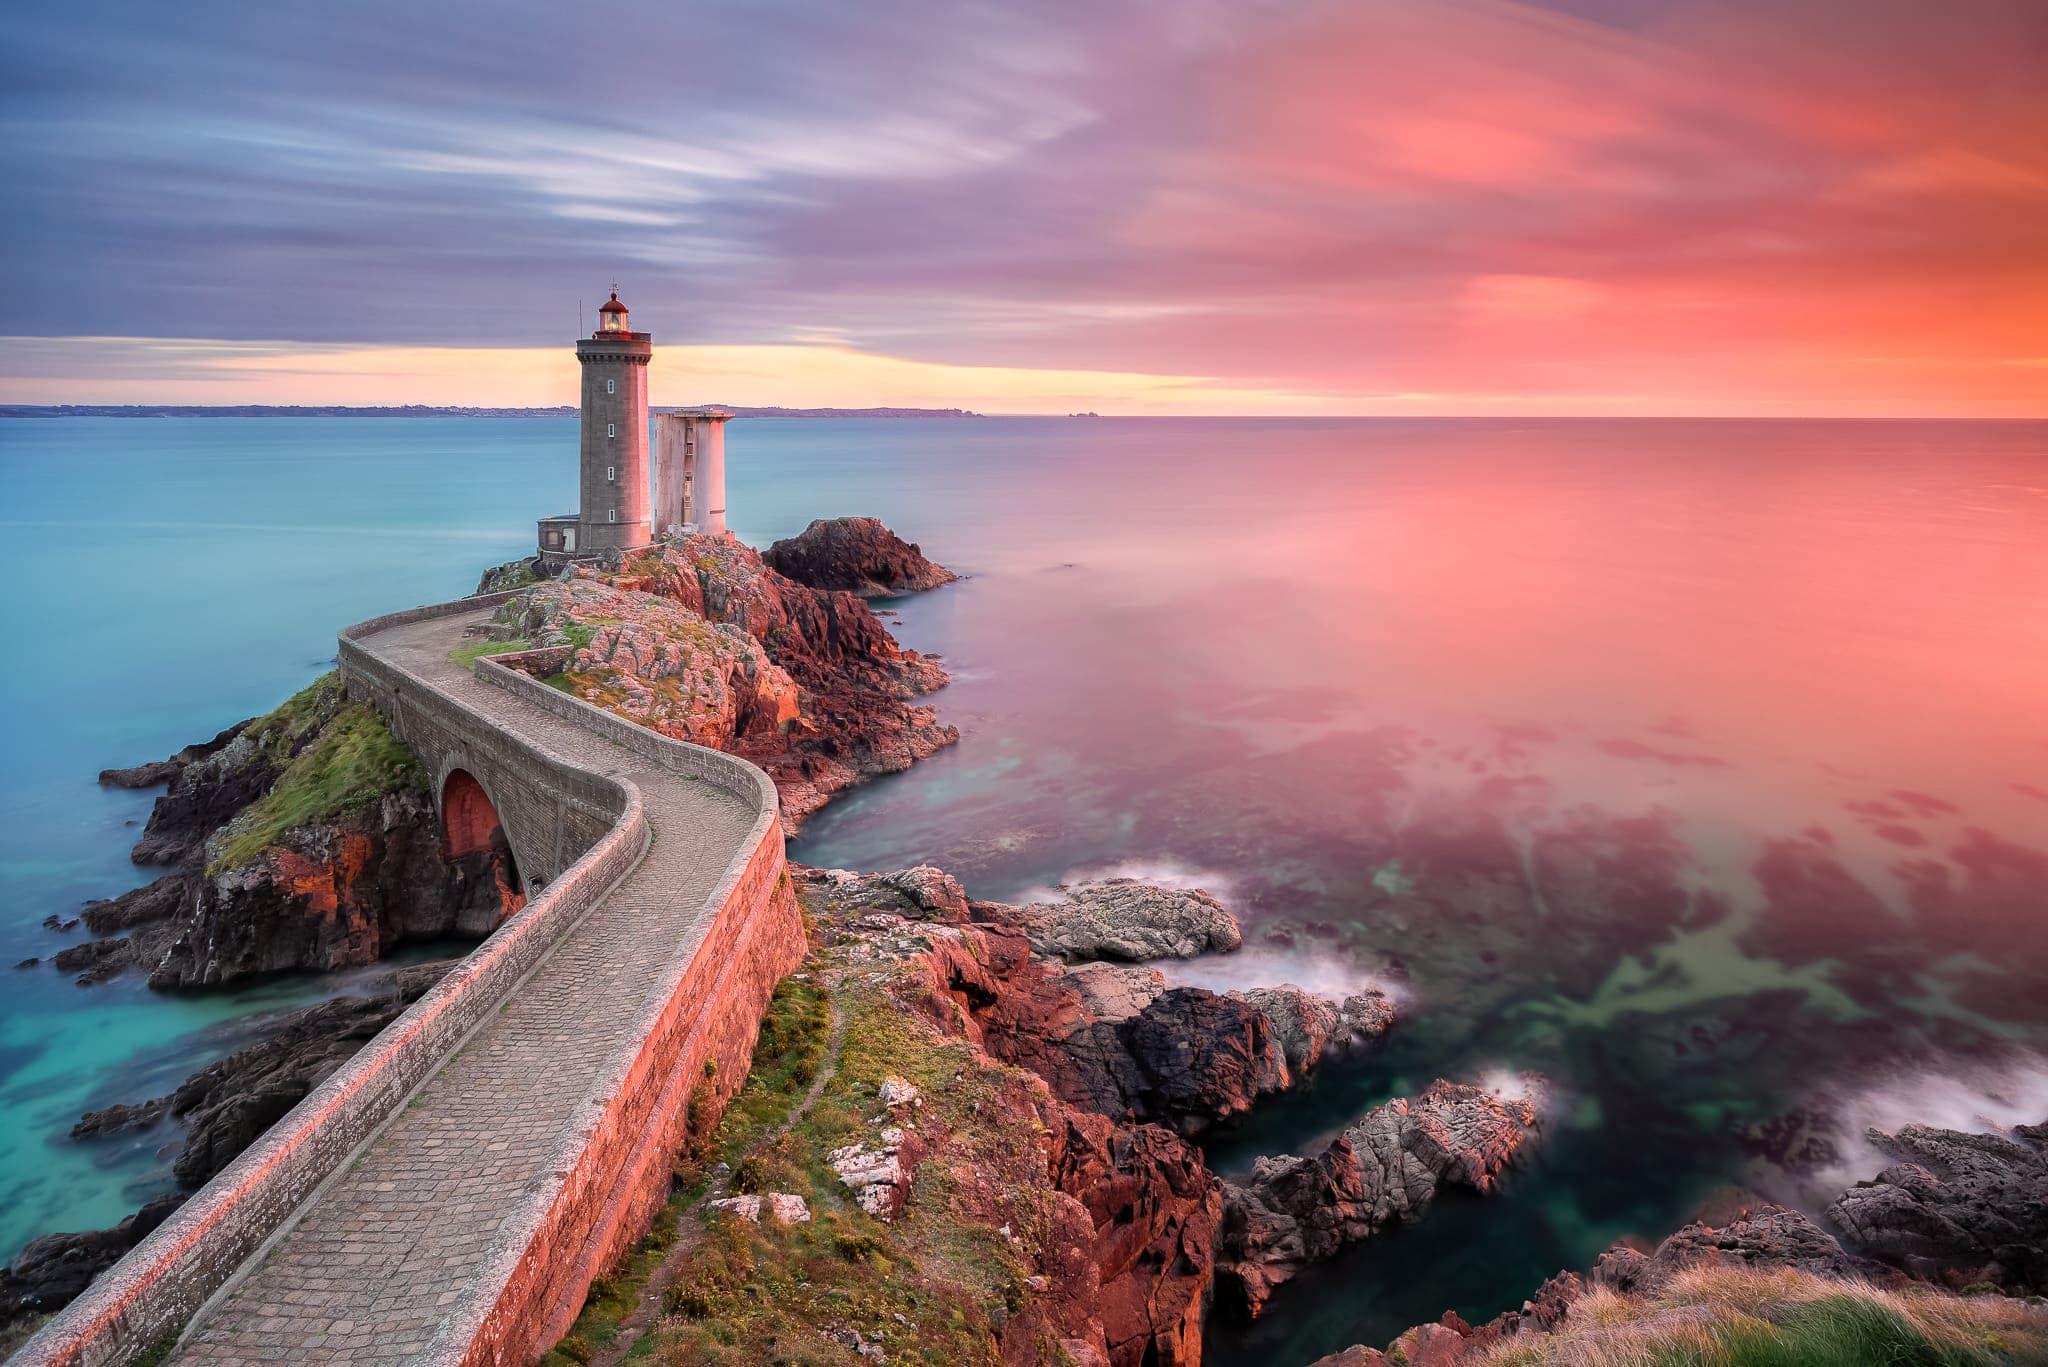 Francesco Gola Seascape Landscape Photography Brittany Bretagne Lighthouse France Petit Minou Long Exposure